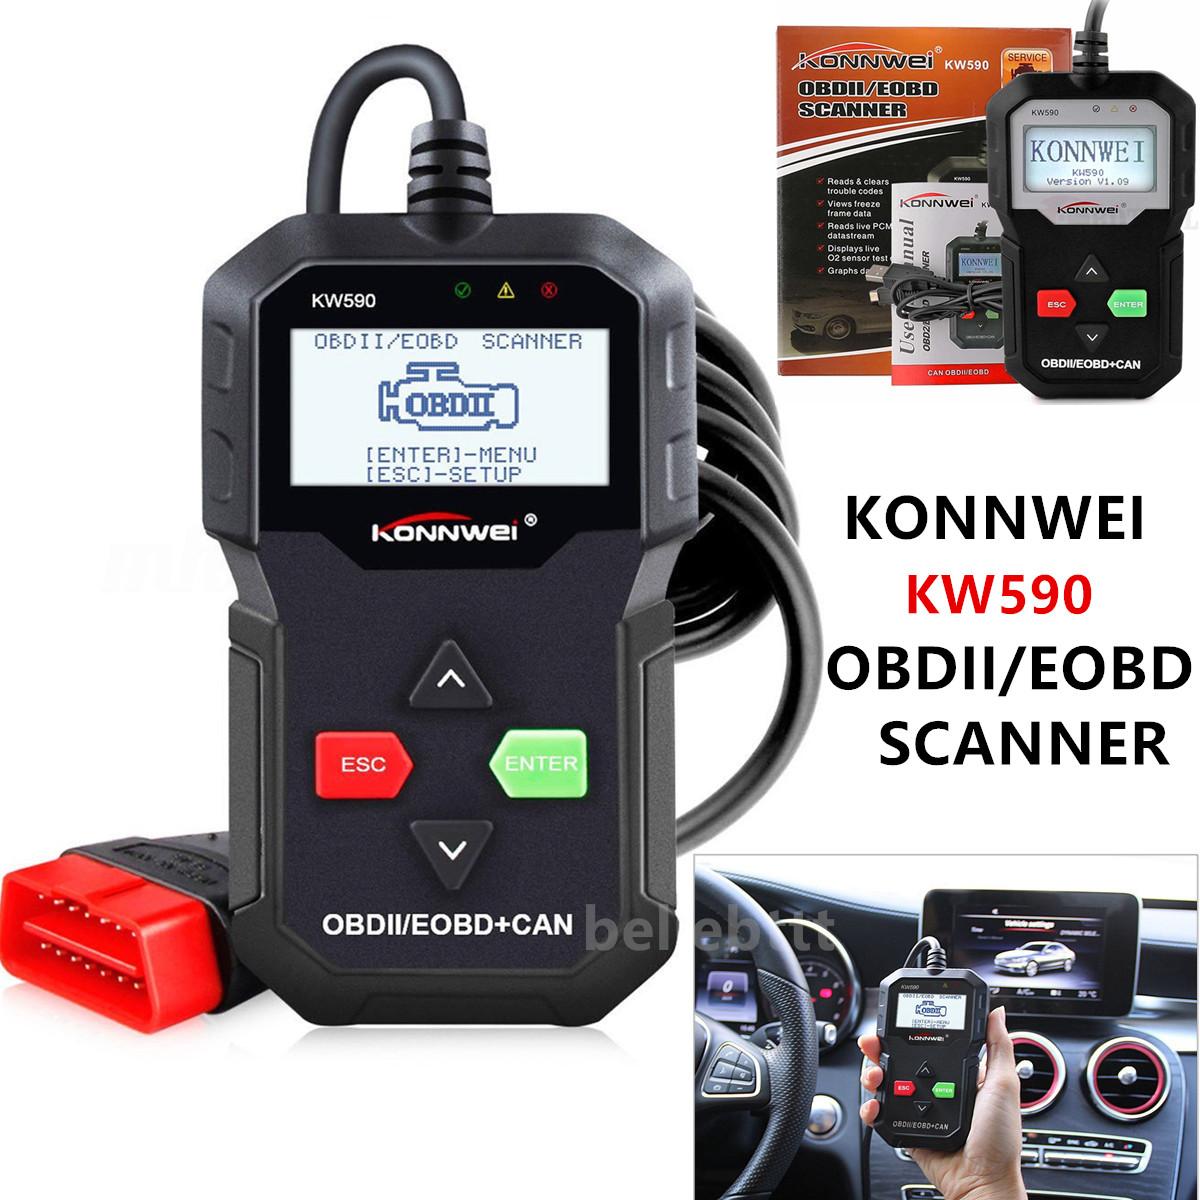 KW590 OBDII EOBD Auto Car Engine Scanner Code Reader Diagnostic Scan Tool